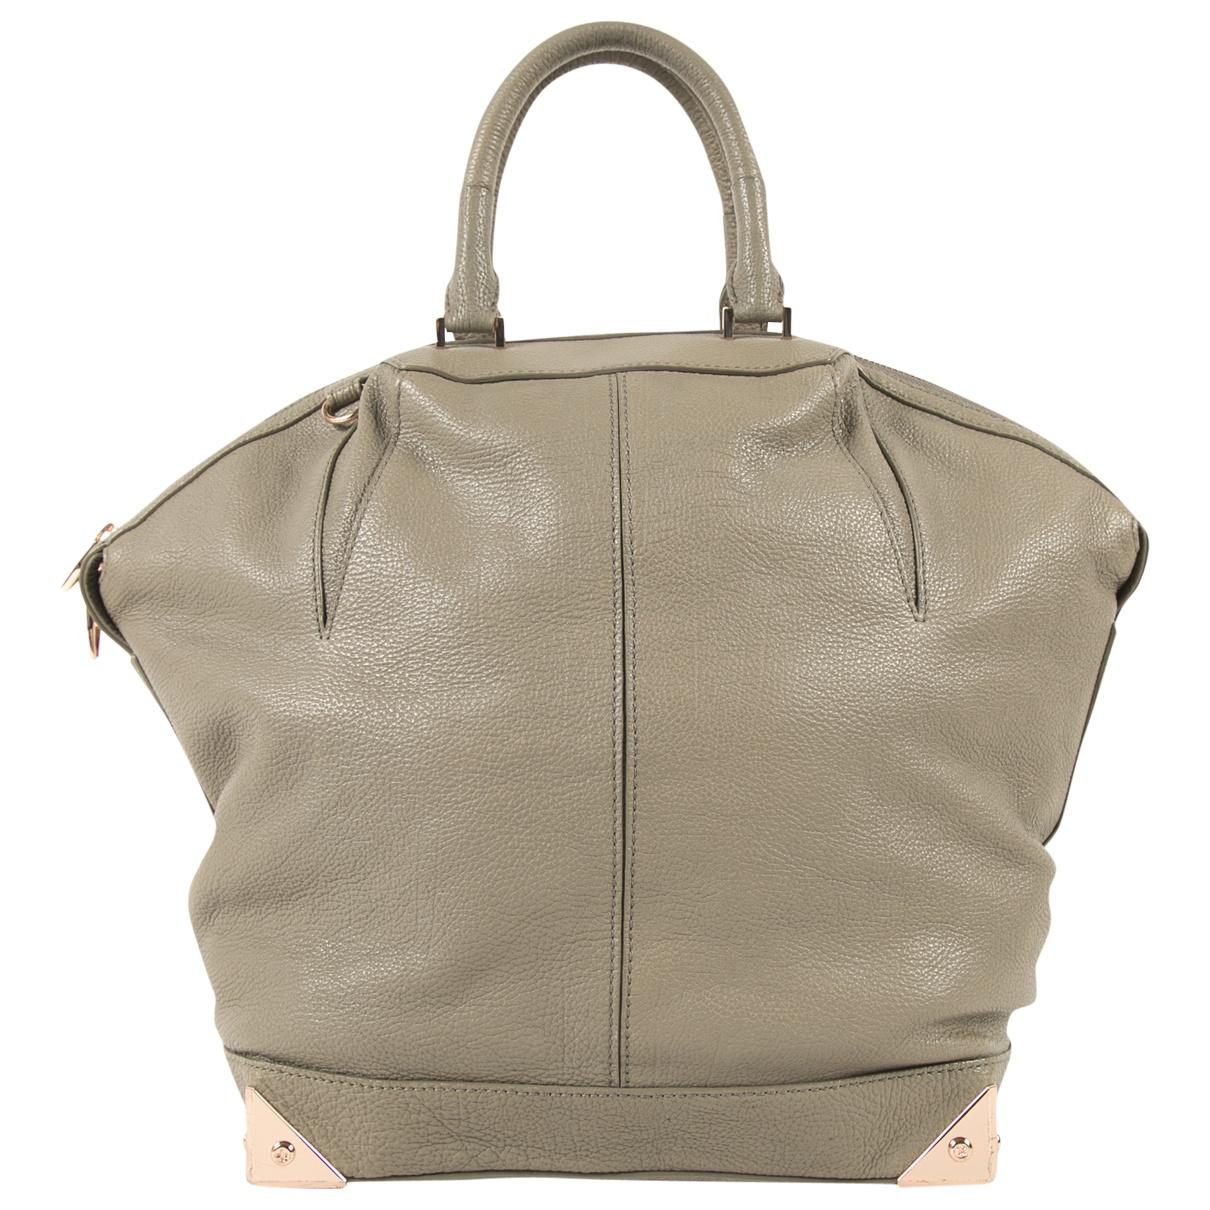 Alexander Wang Pre-owned - Emile leather handbag qhRsl